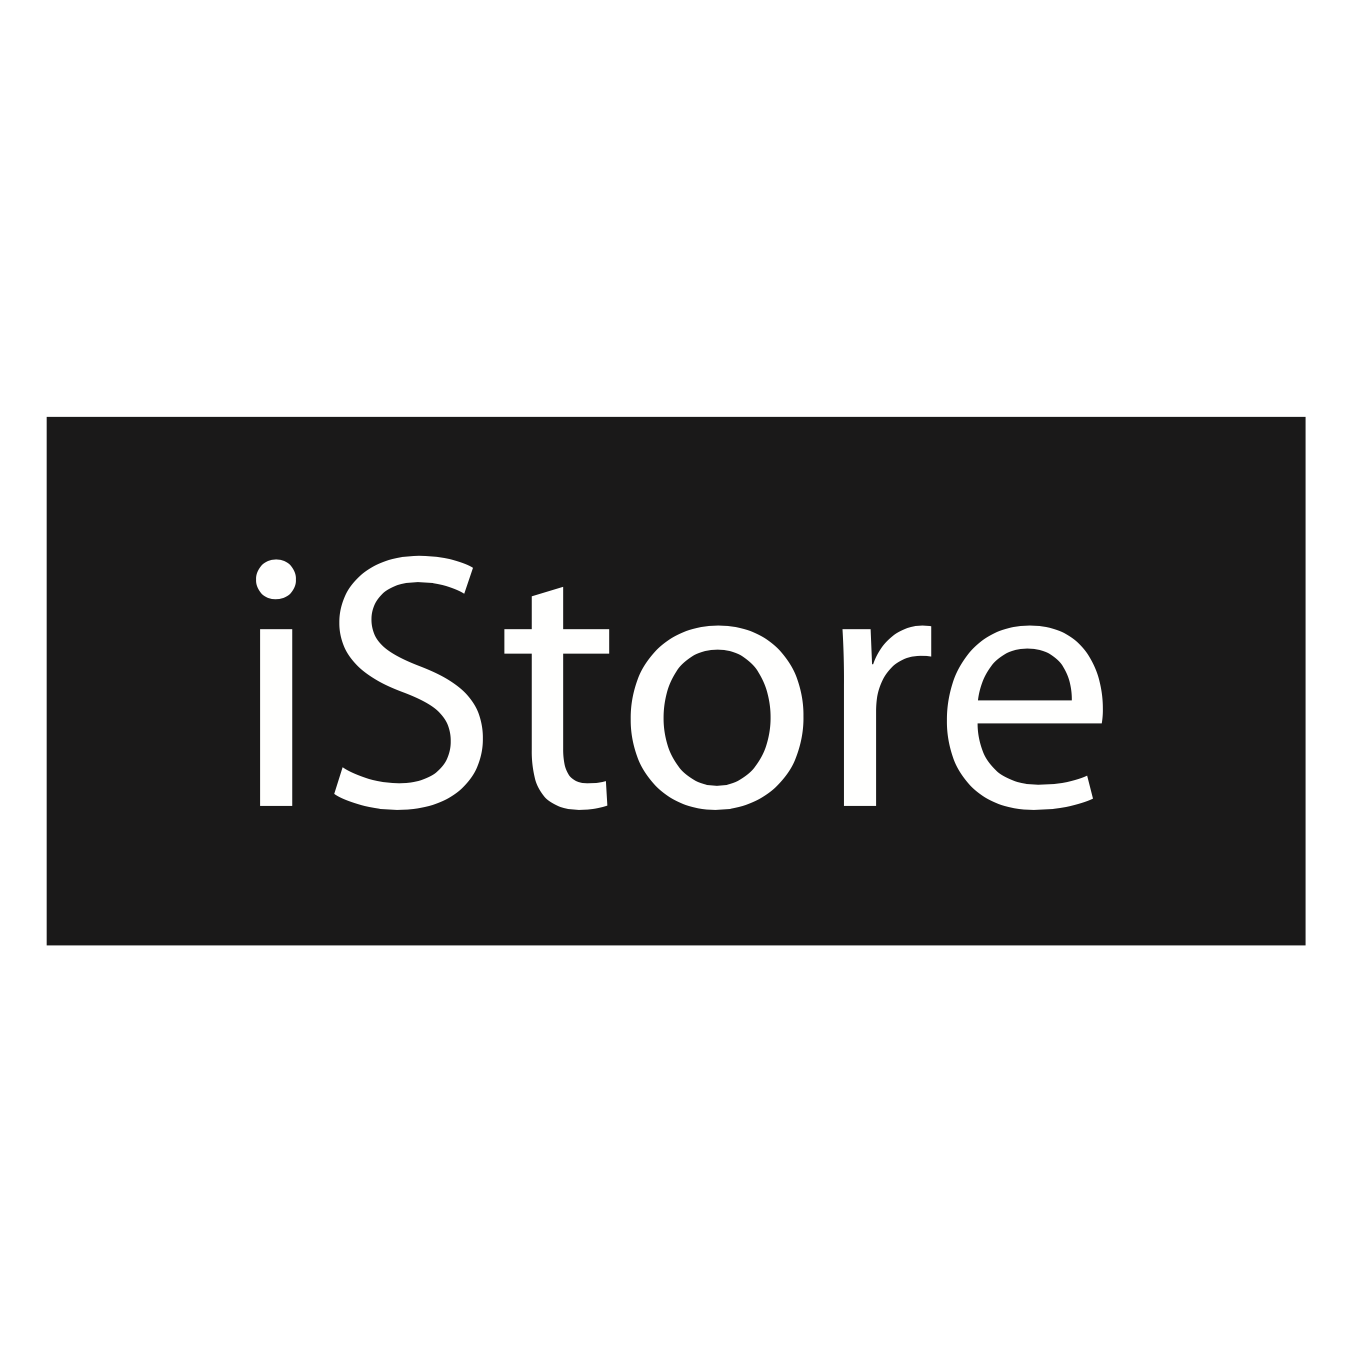 iPhone 8 Plus 128GB - Space Grey